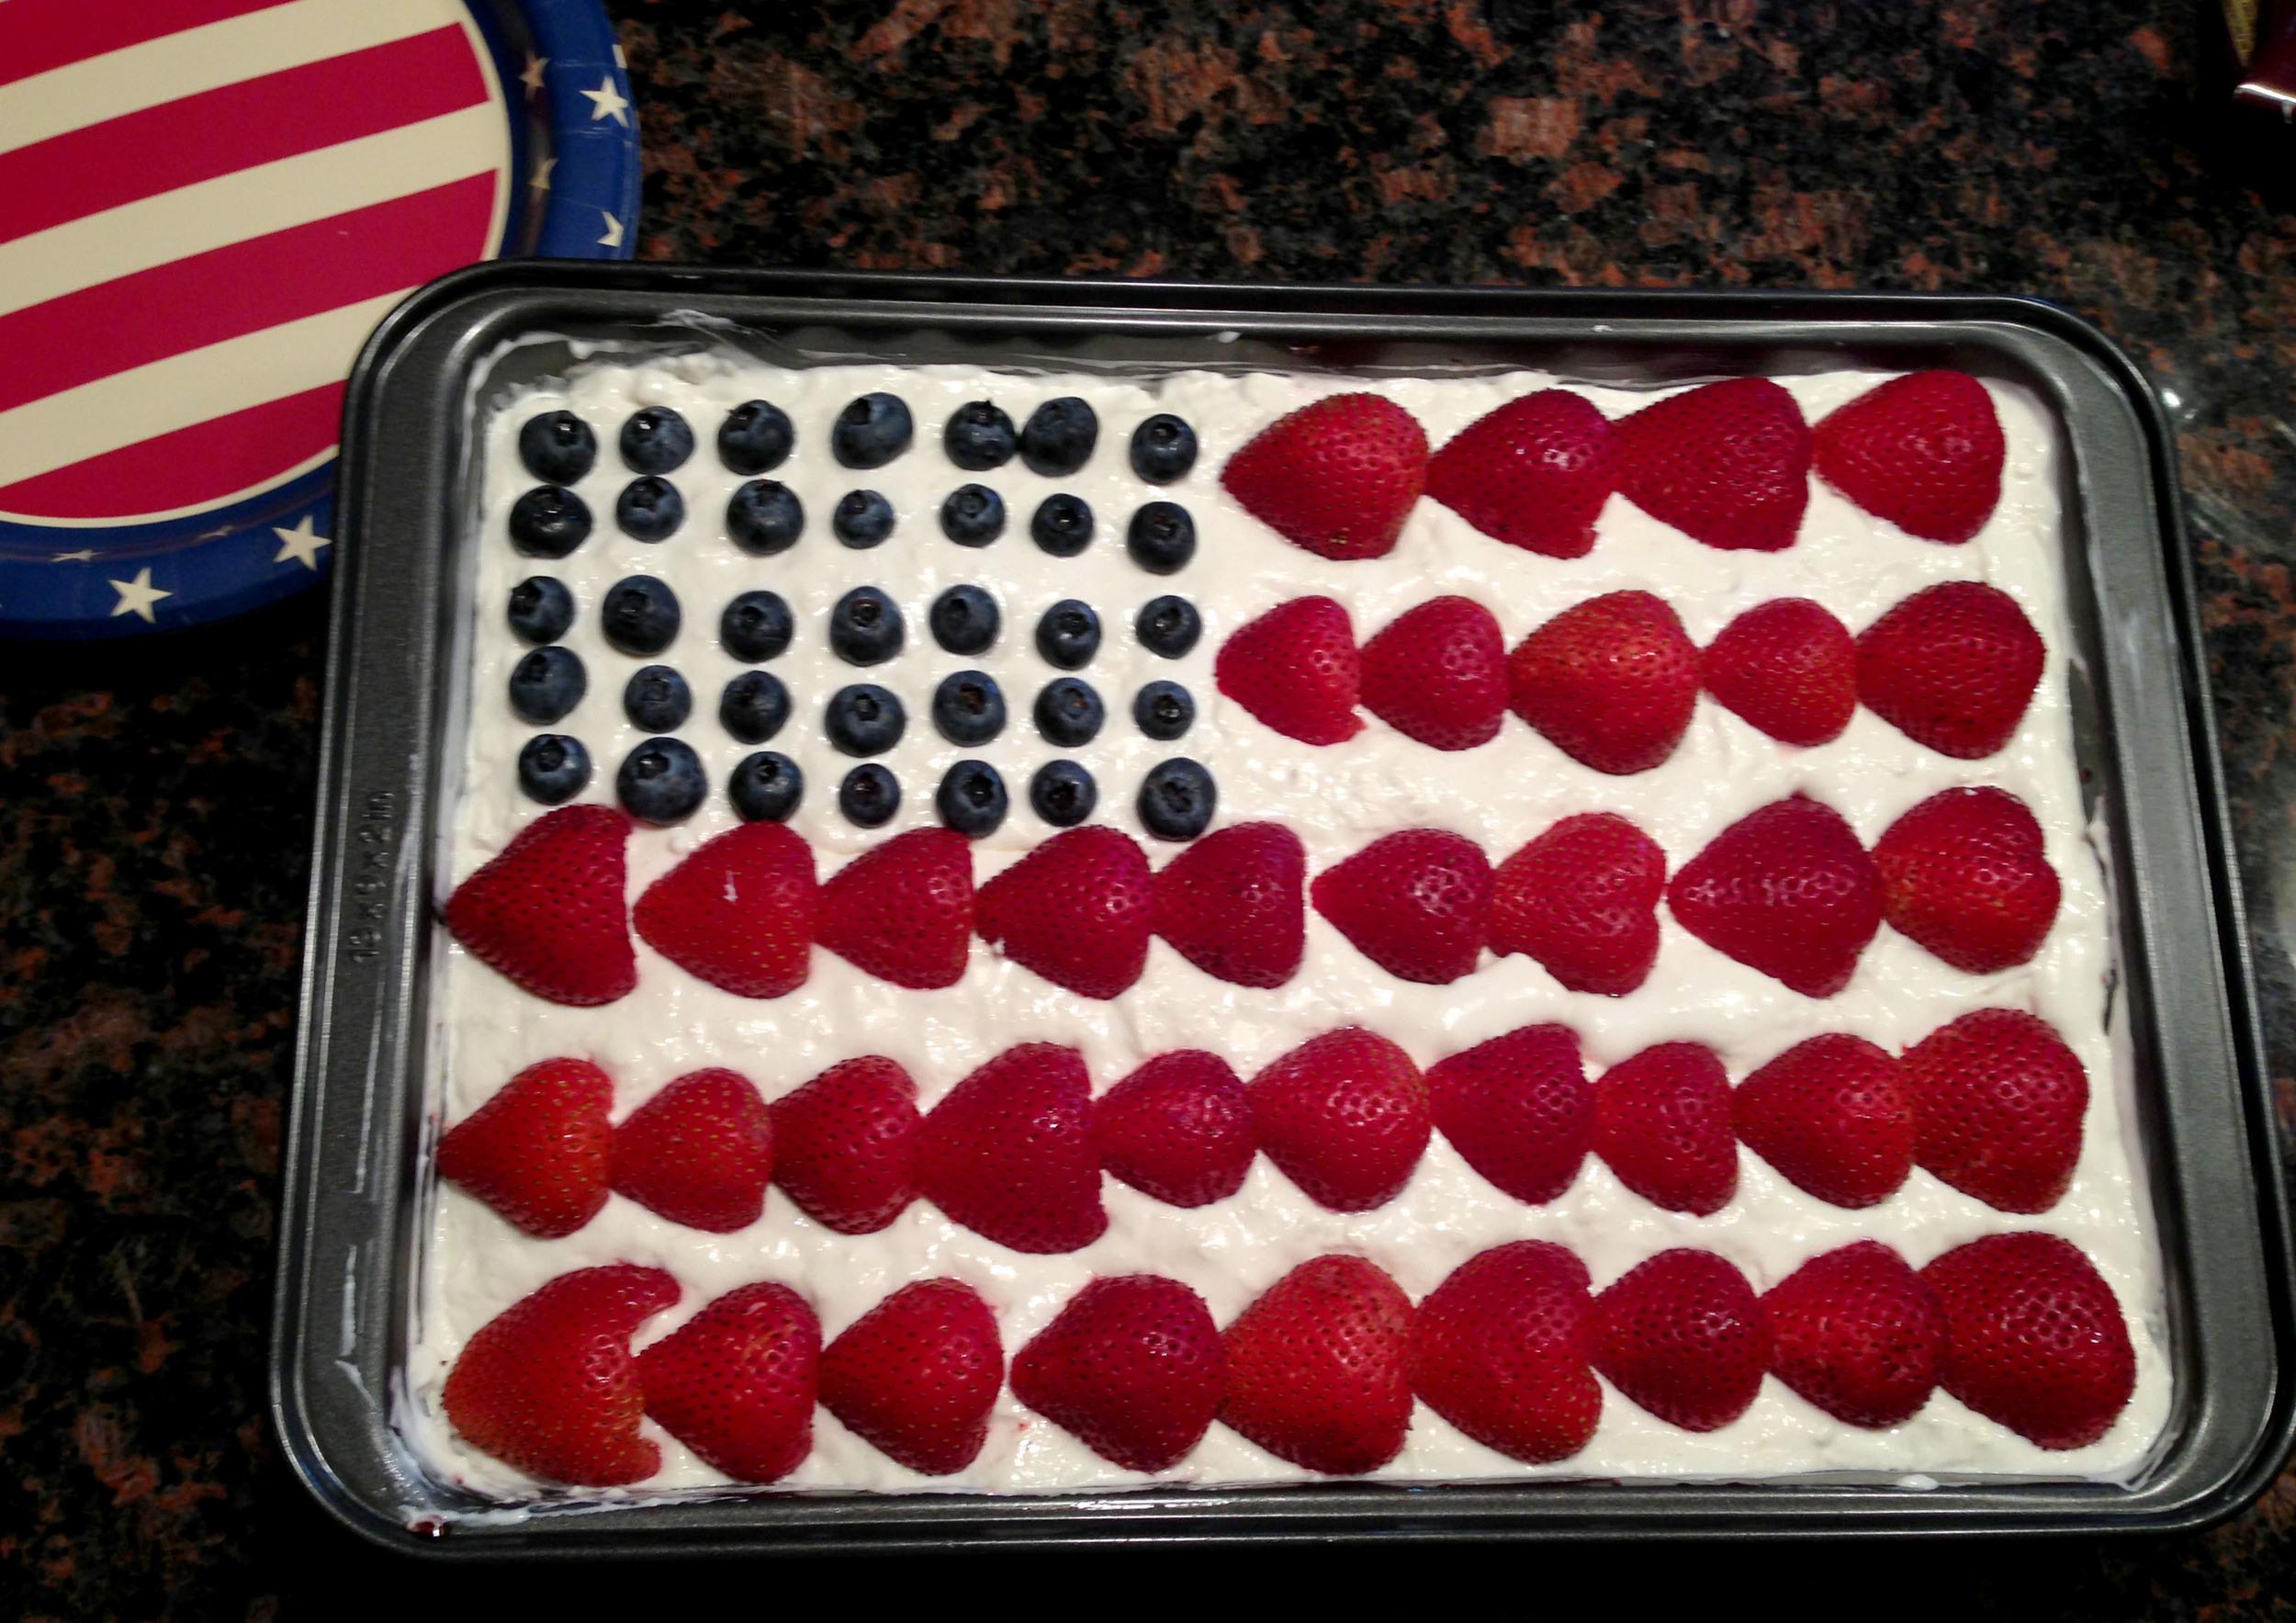 Tastiest American flag I've ever seen!